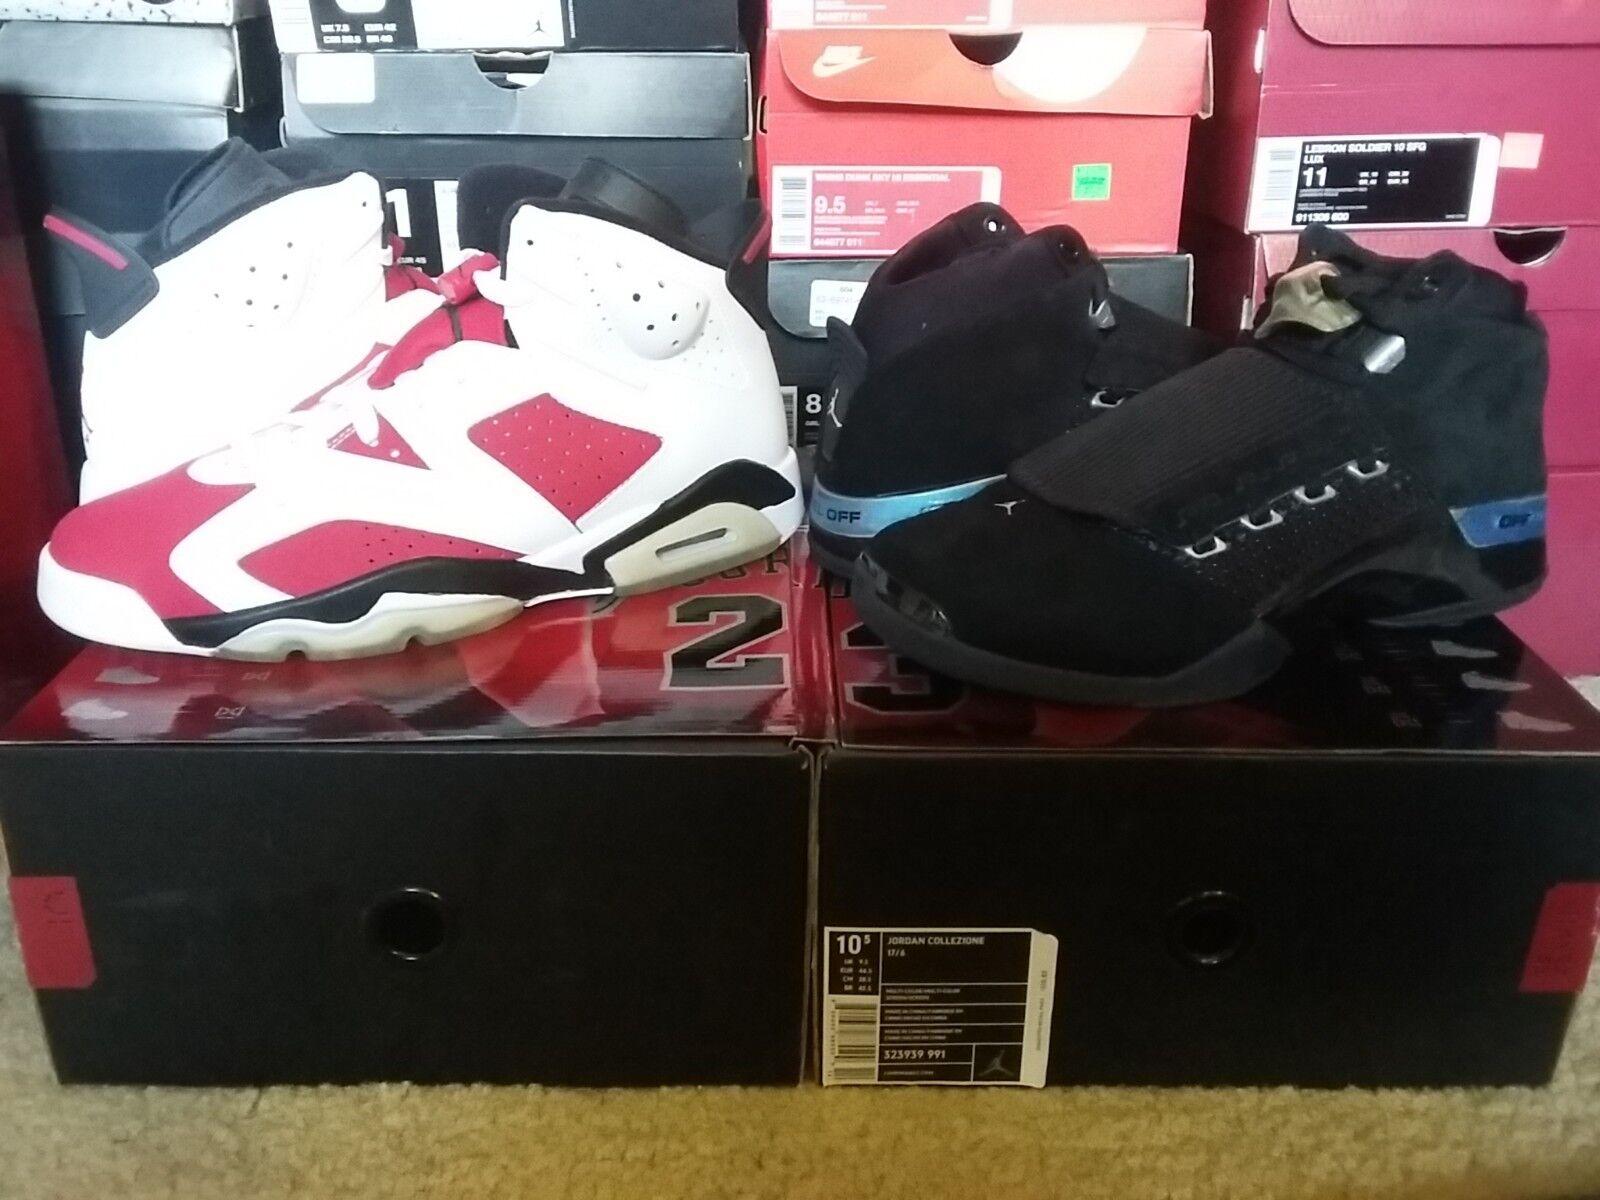 2008 Nike Air Jordan Collezione 17 6 VI XVII Retro CDP Countdown Pack 323939 991